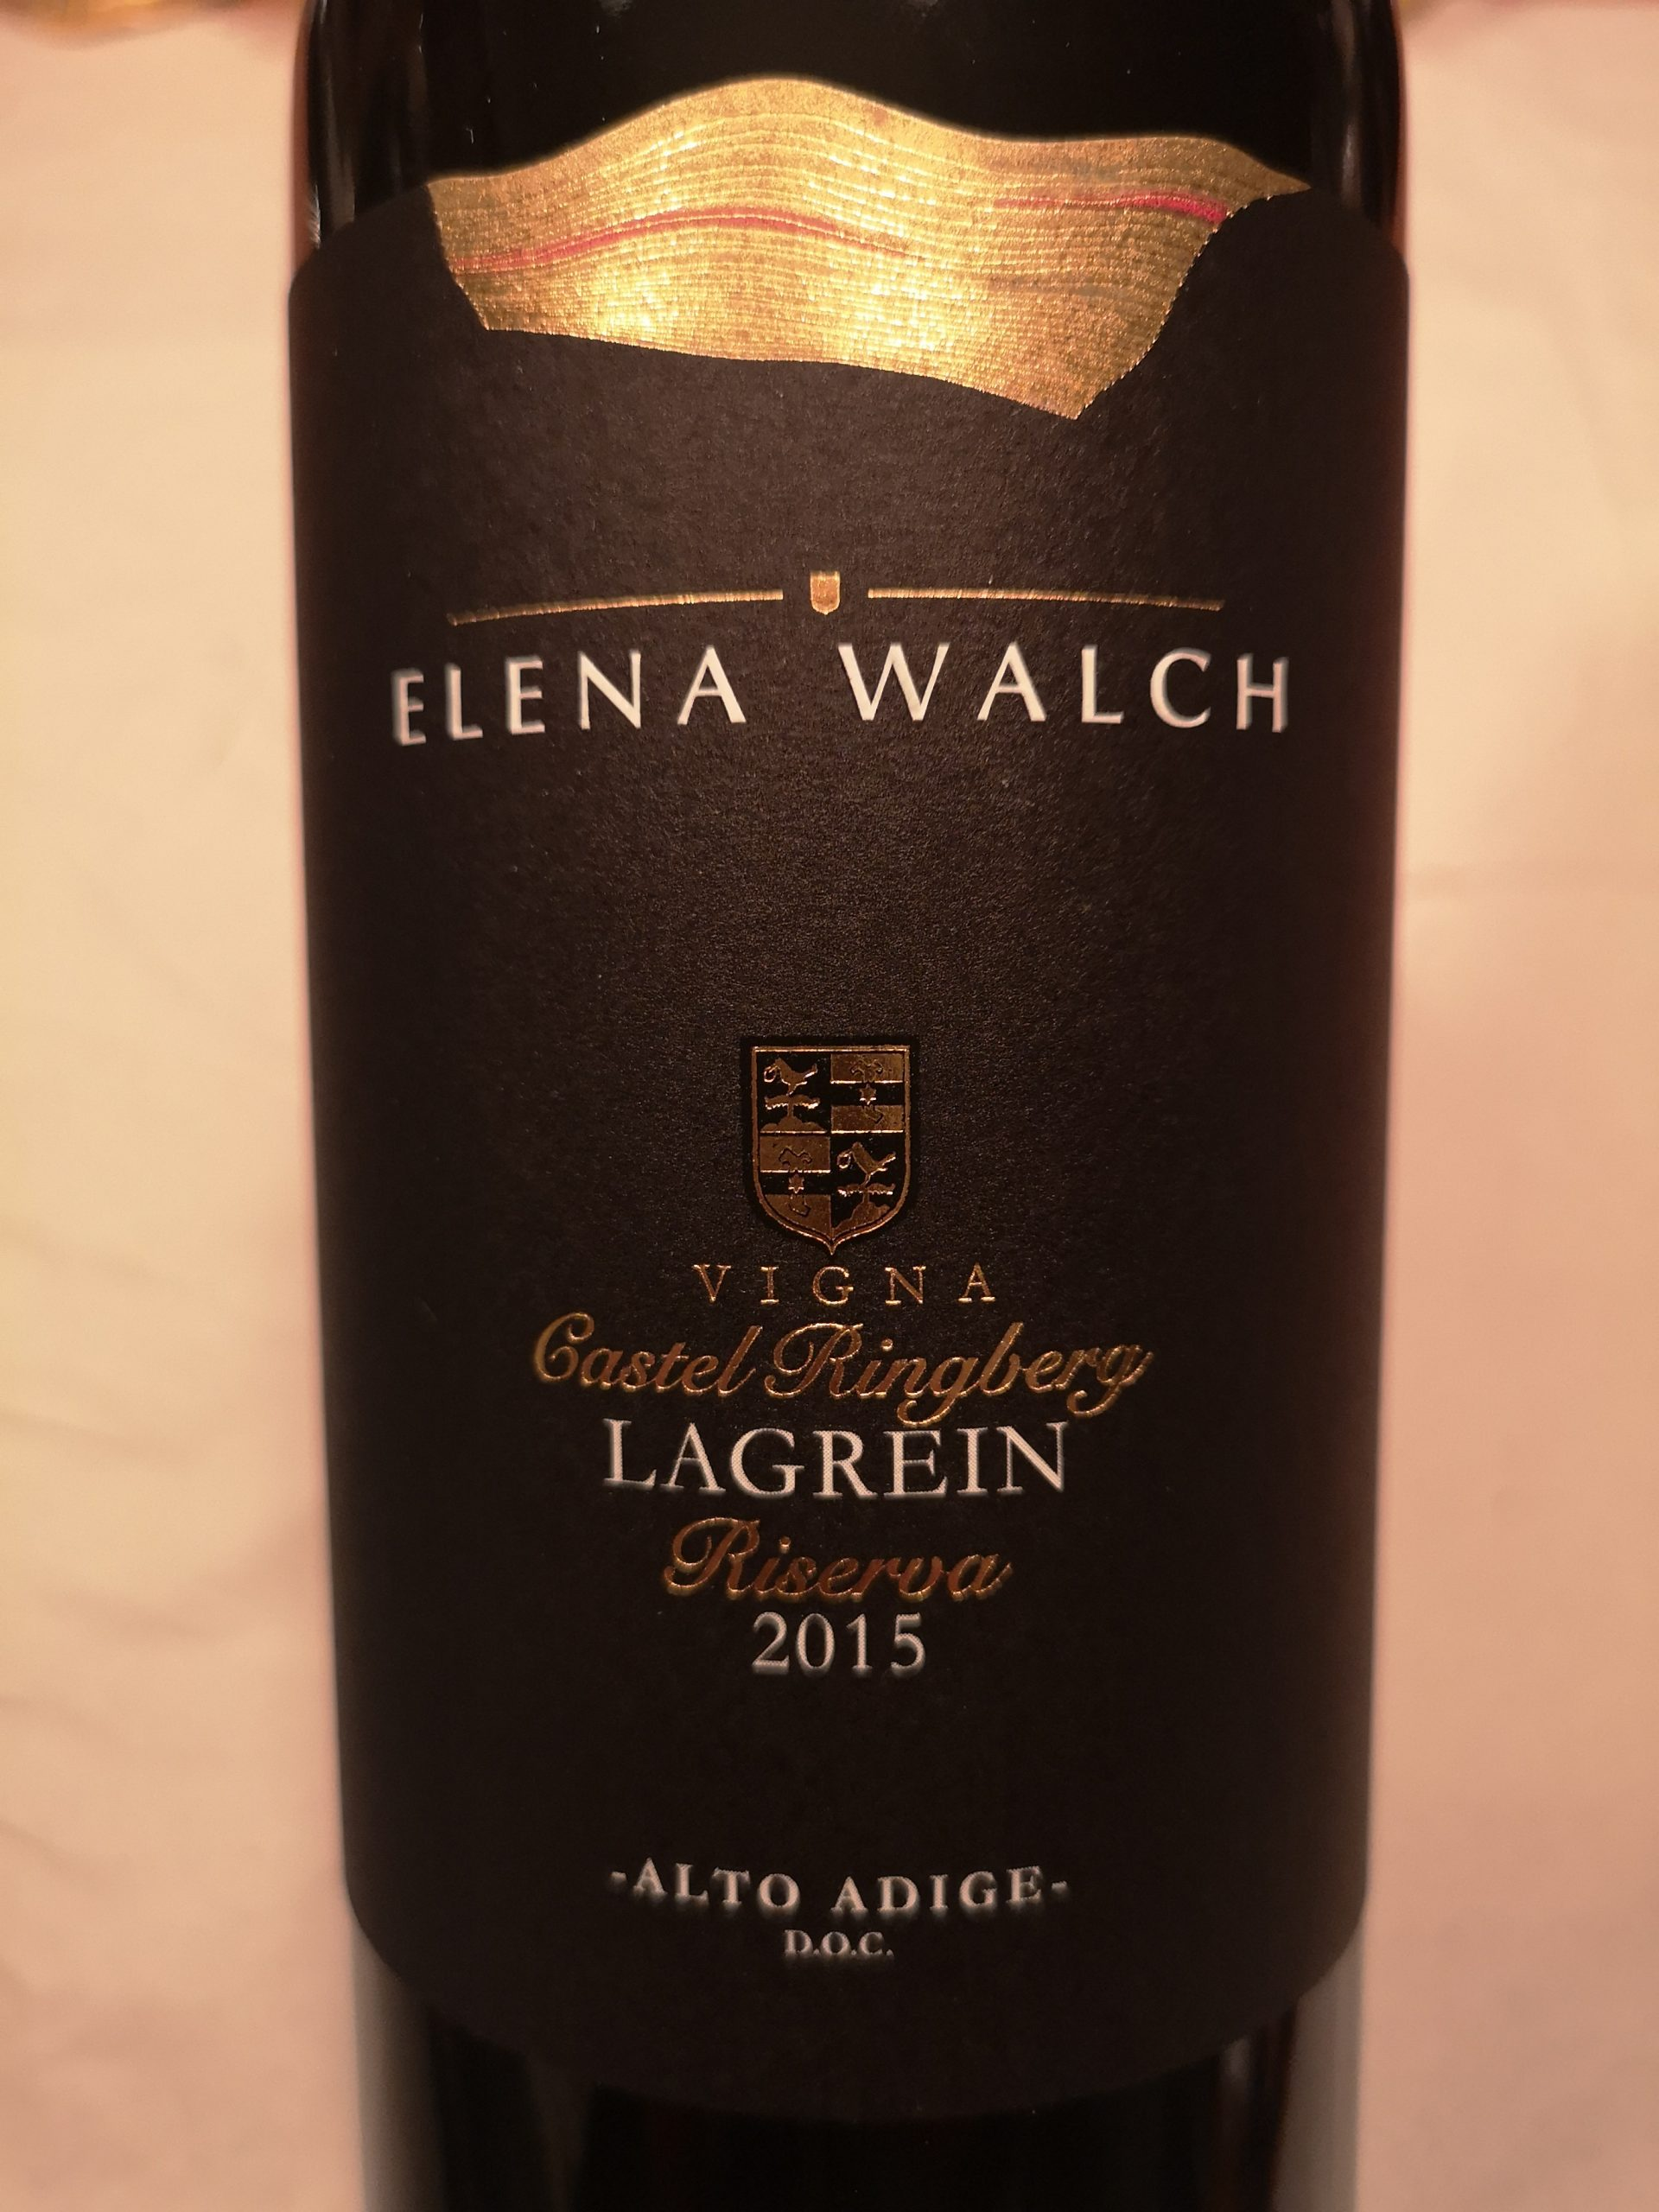 2015 Lagrein Riserva Castel Ringberg | Walch